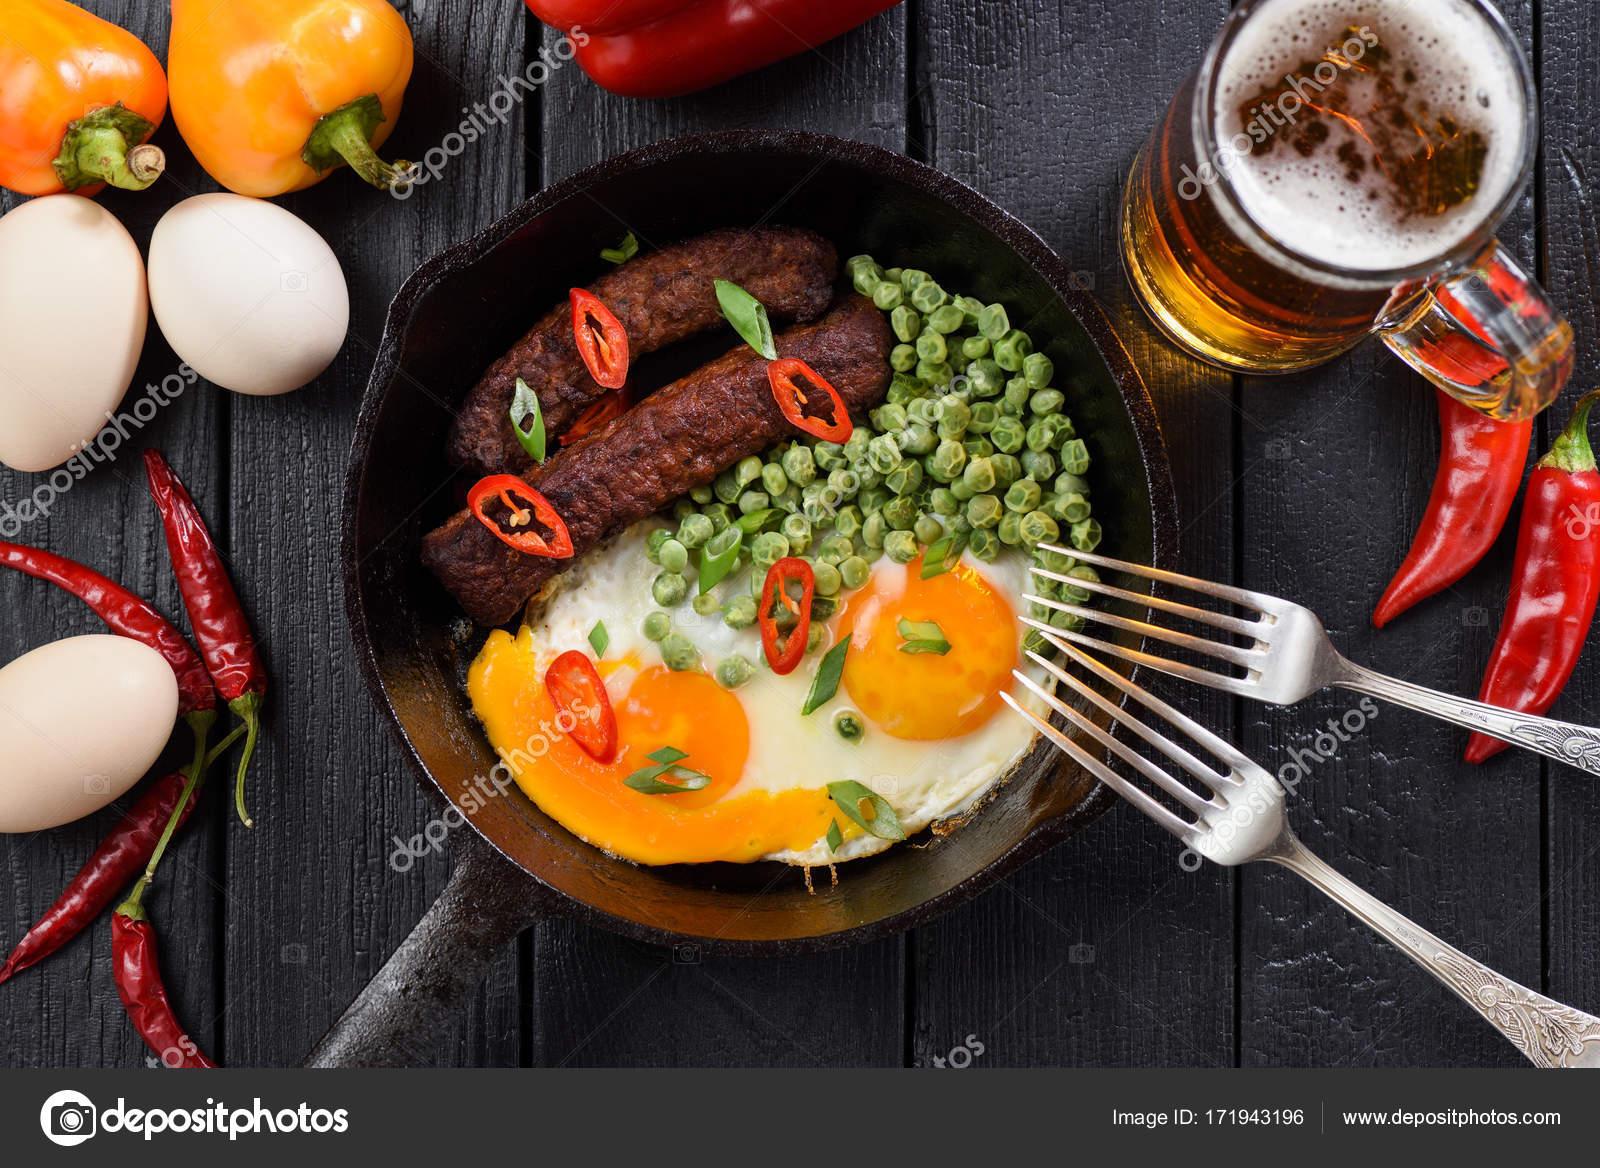 Pranzo Proteico Leggero : Pranzo proteico a base di tonno piselli e cous cous francesca